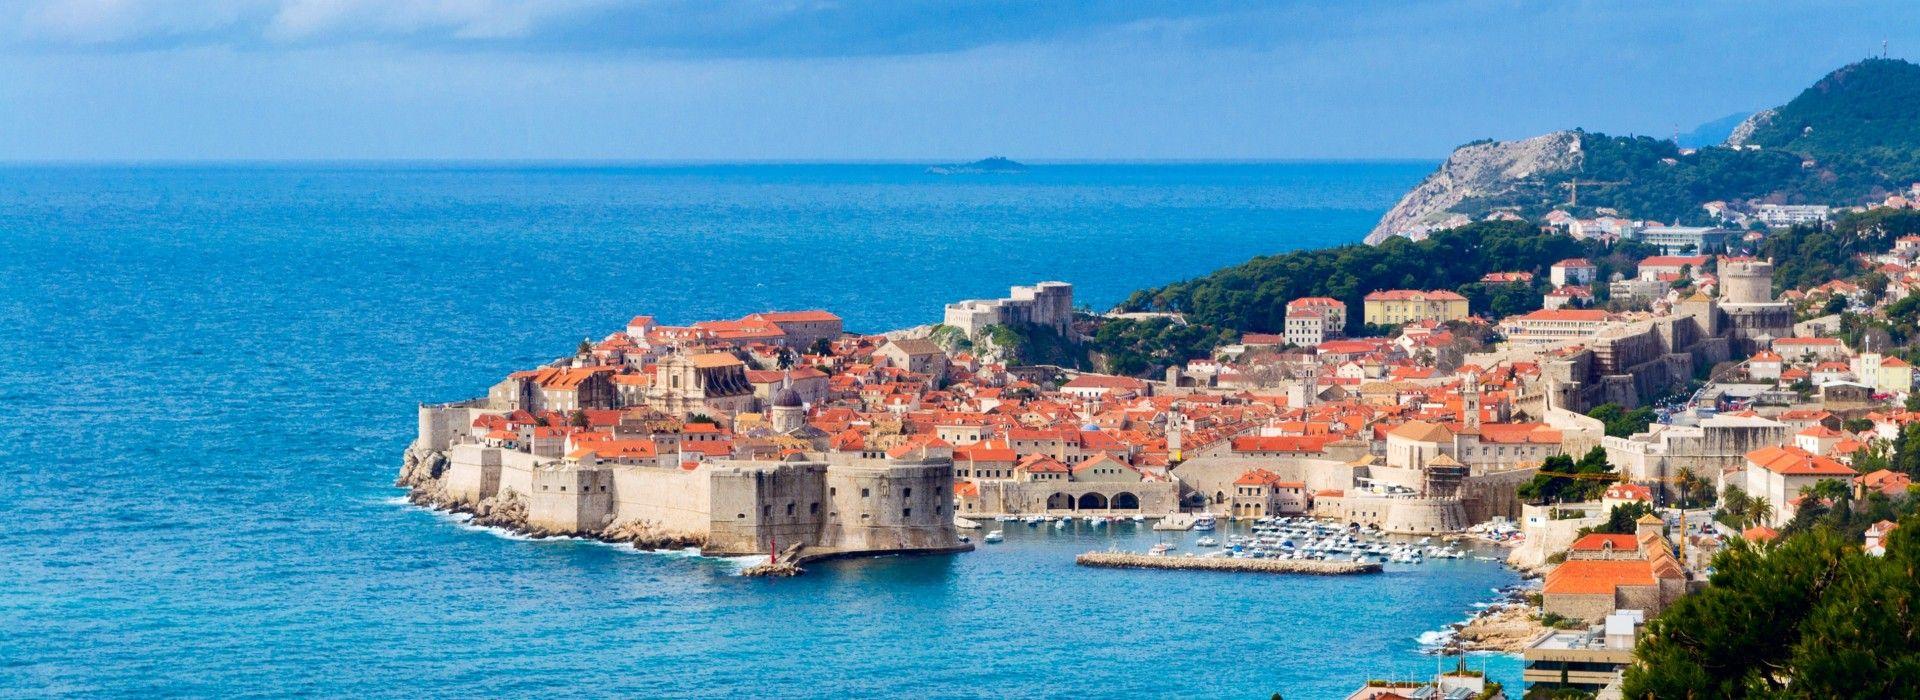 Luxury Tours in Croatia